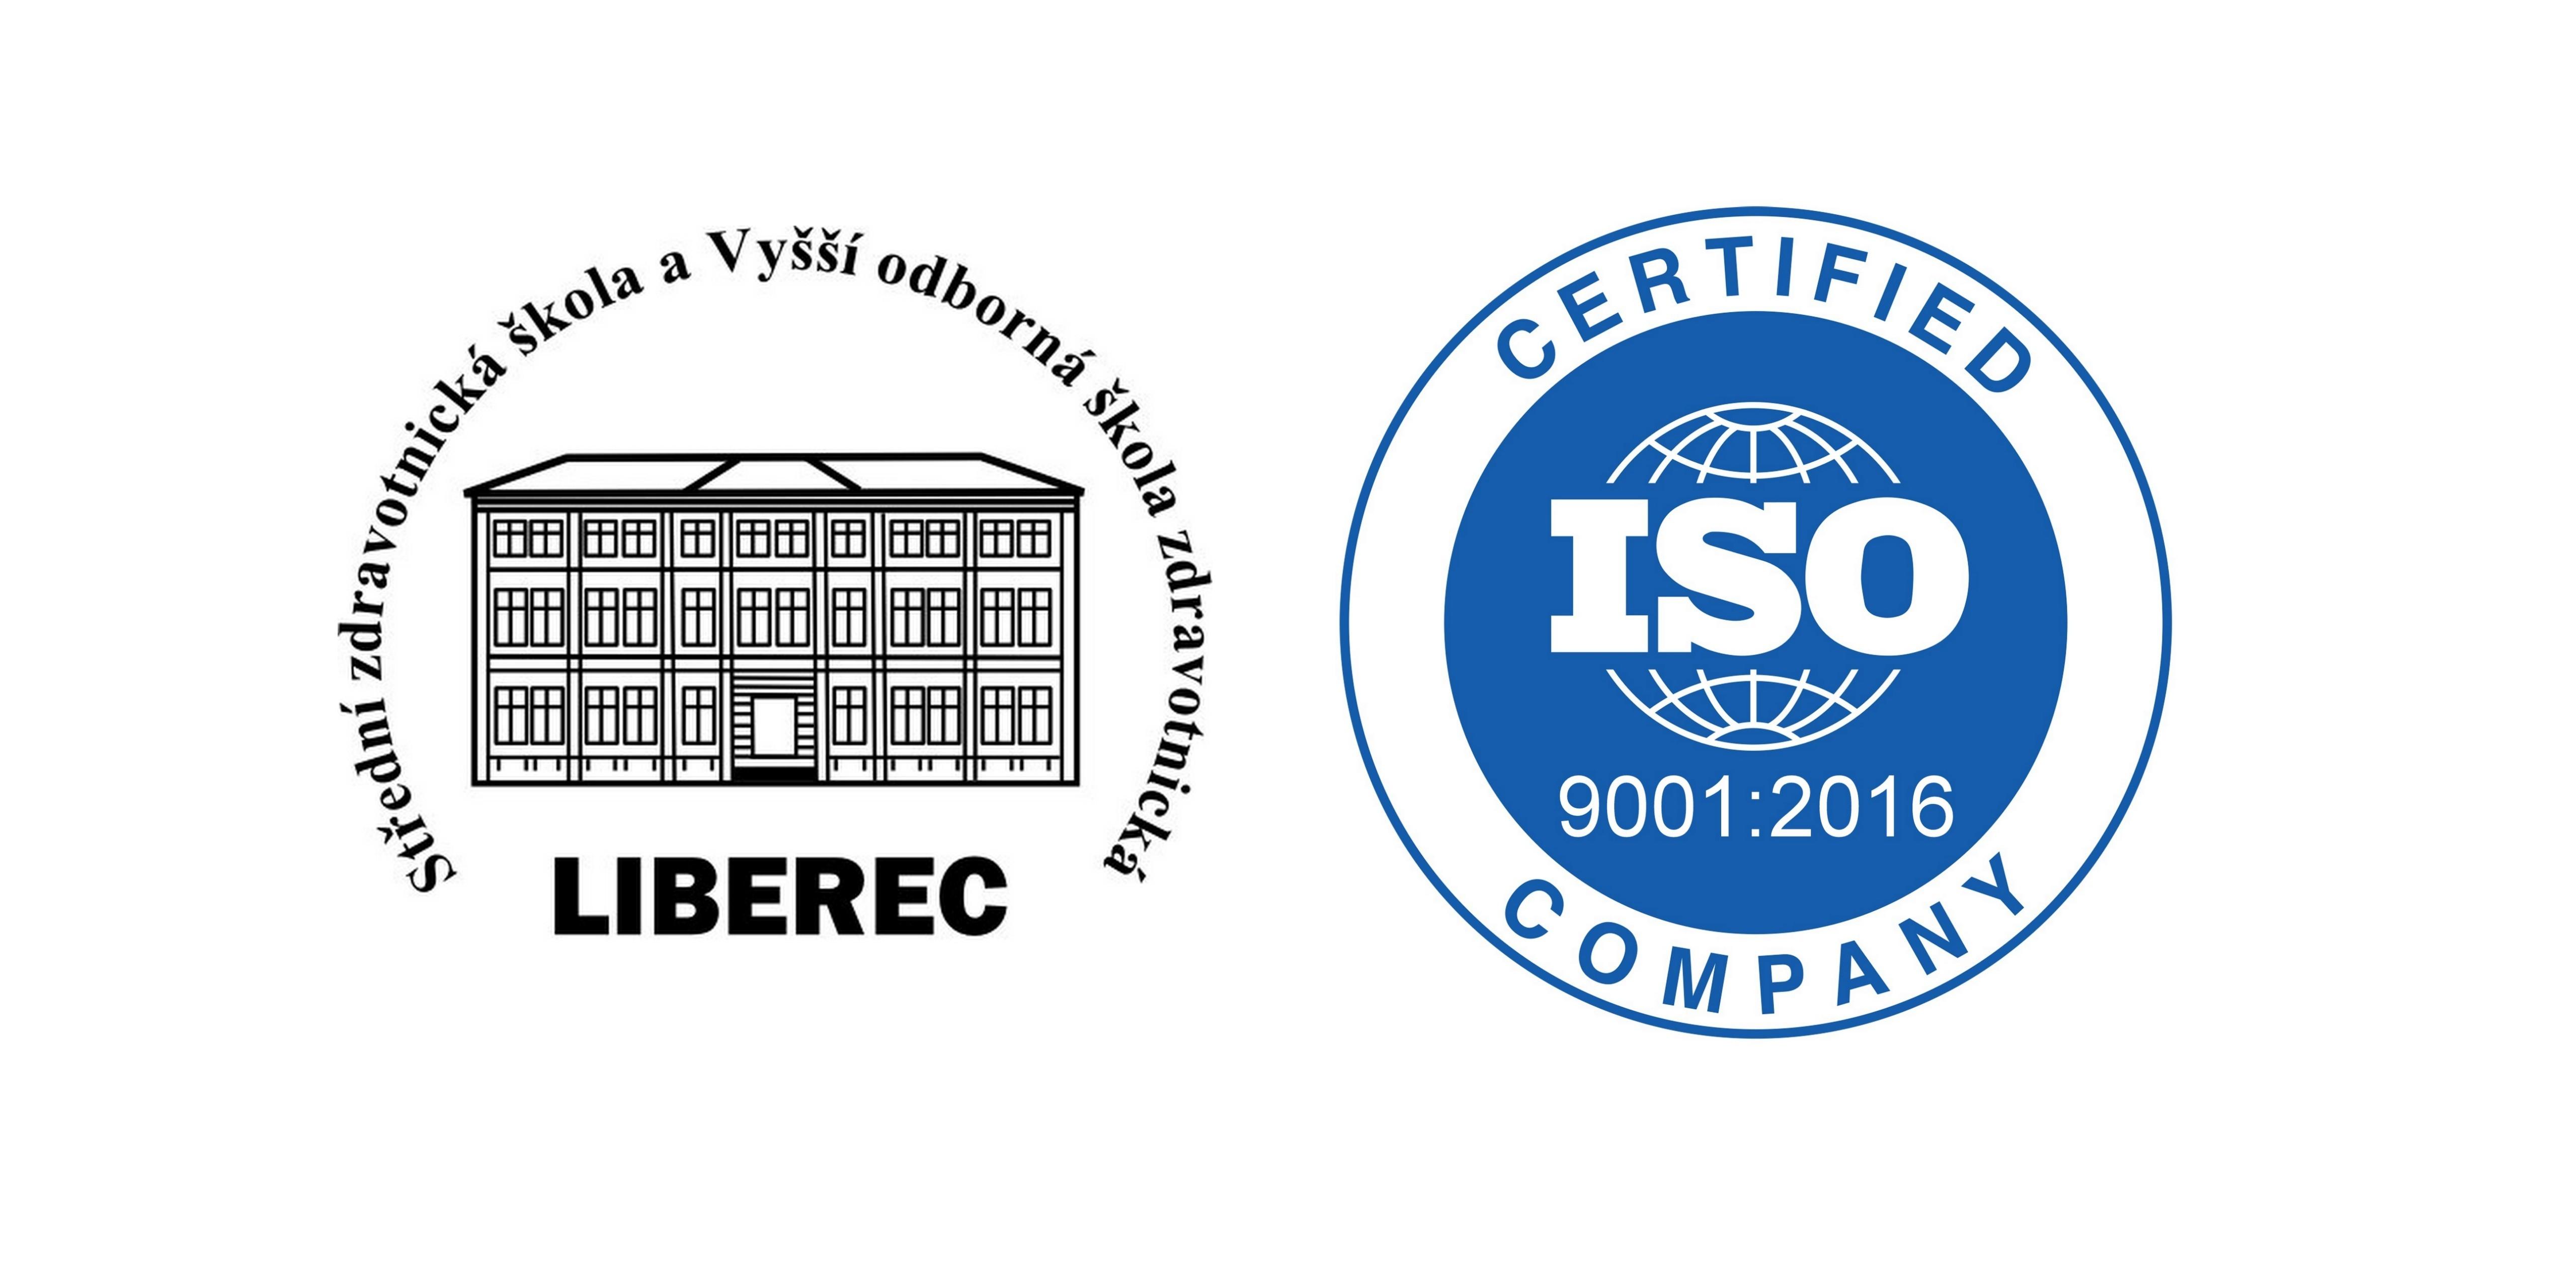 liberecka-zdravka-szs-vos-zdravotnicka-certifikace-iso